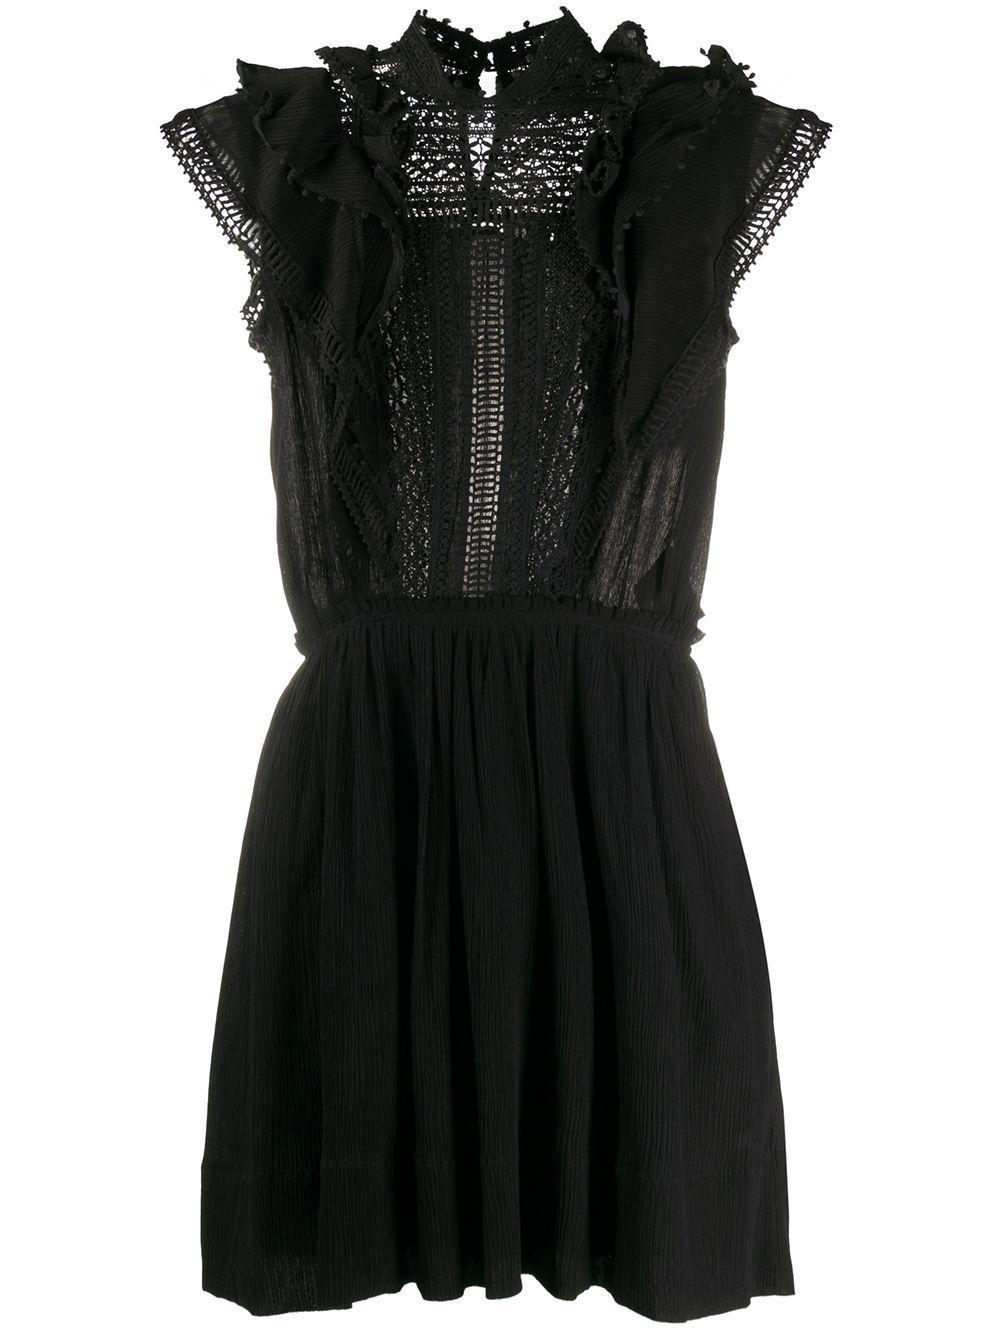 Ruffle Shoulder Solid Fit Flare Dress Item # IANELIA